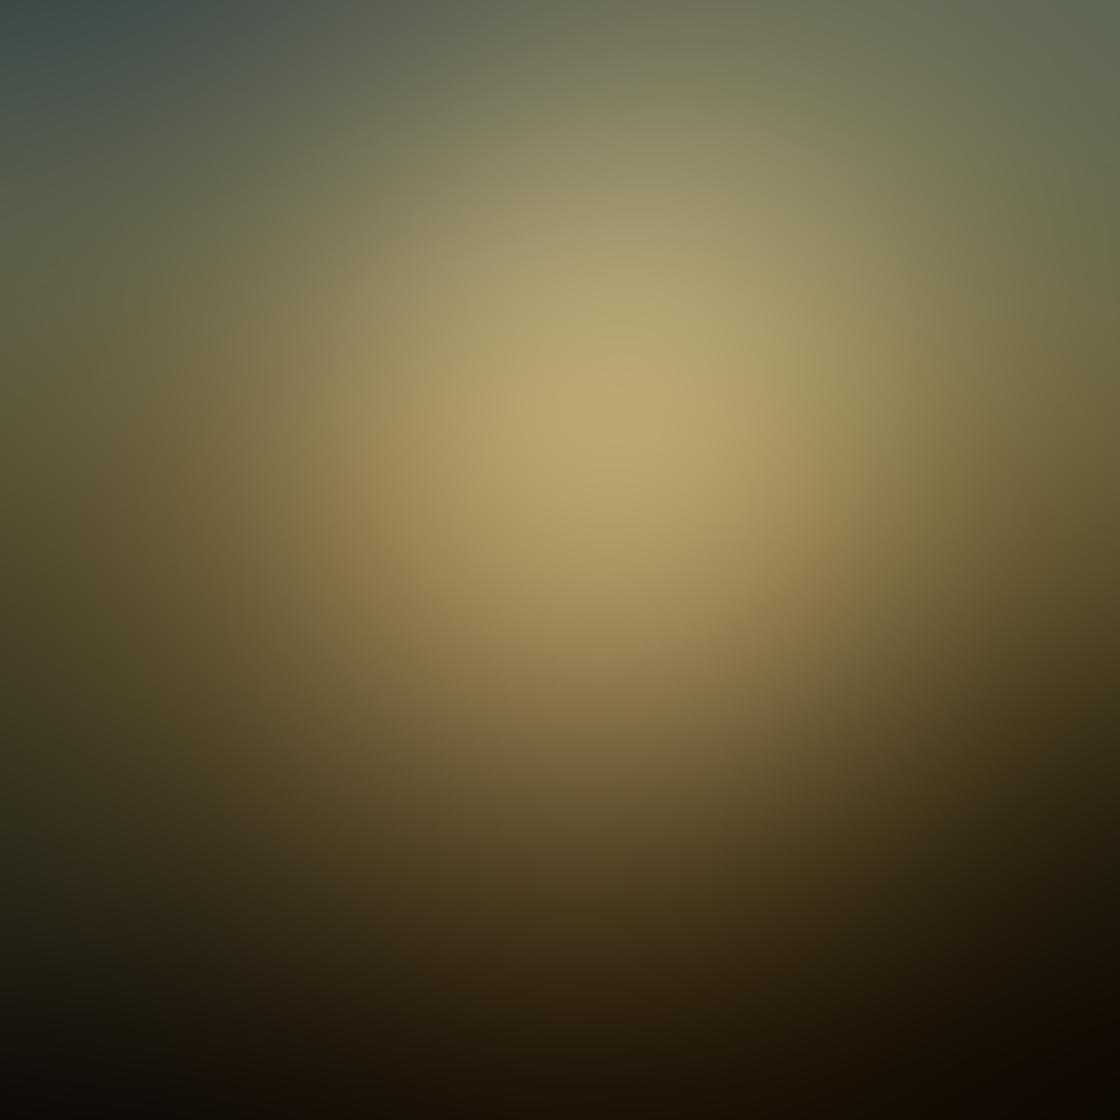 iPhone Sun Photo 07